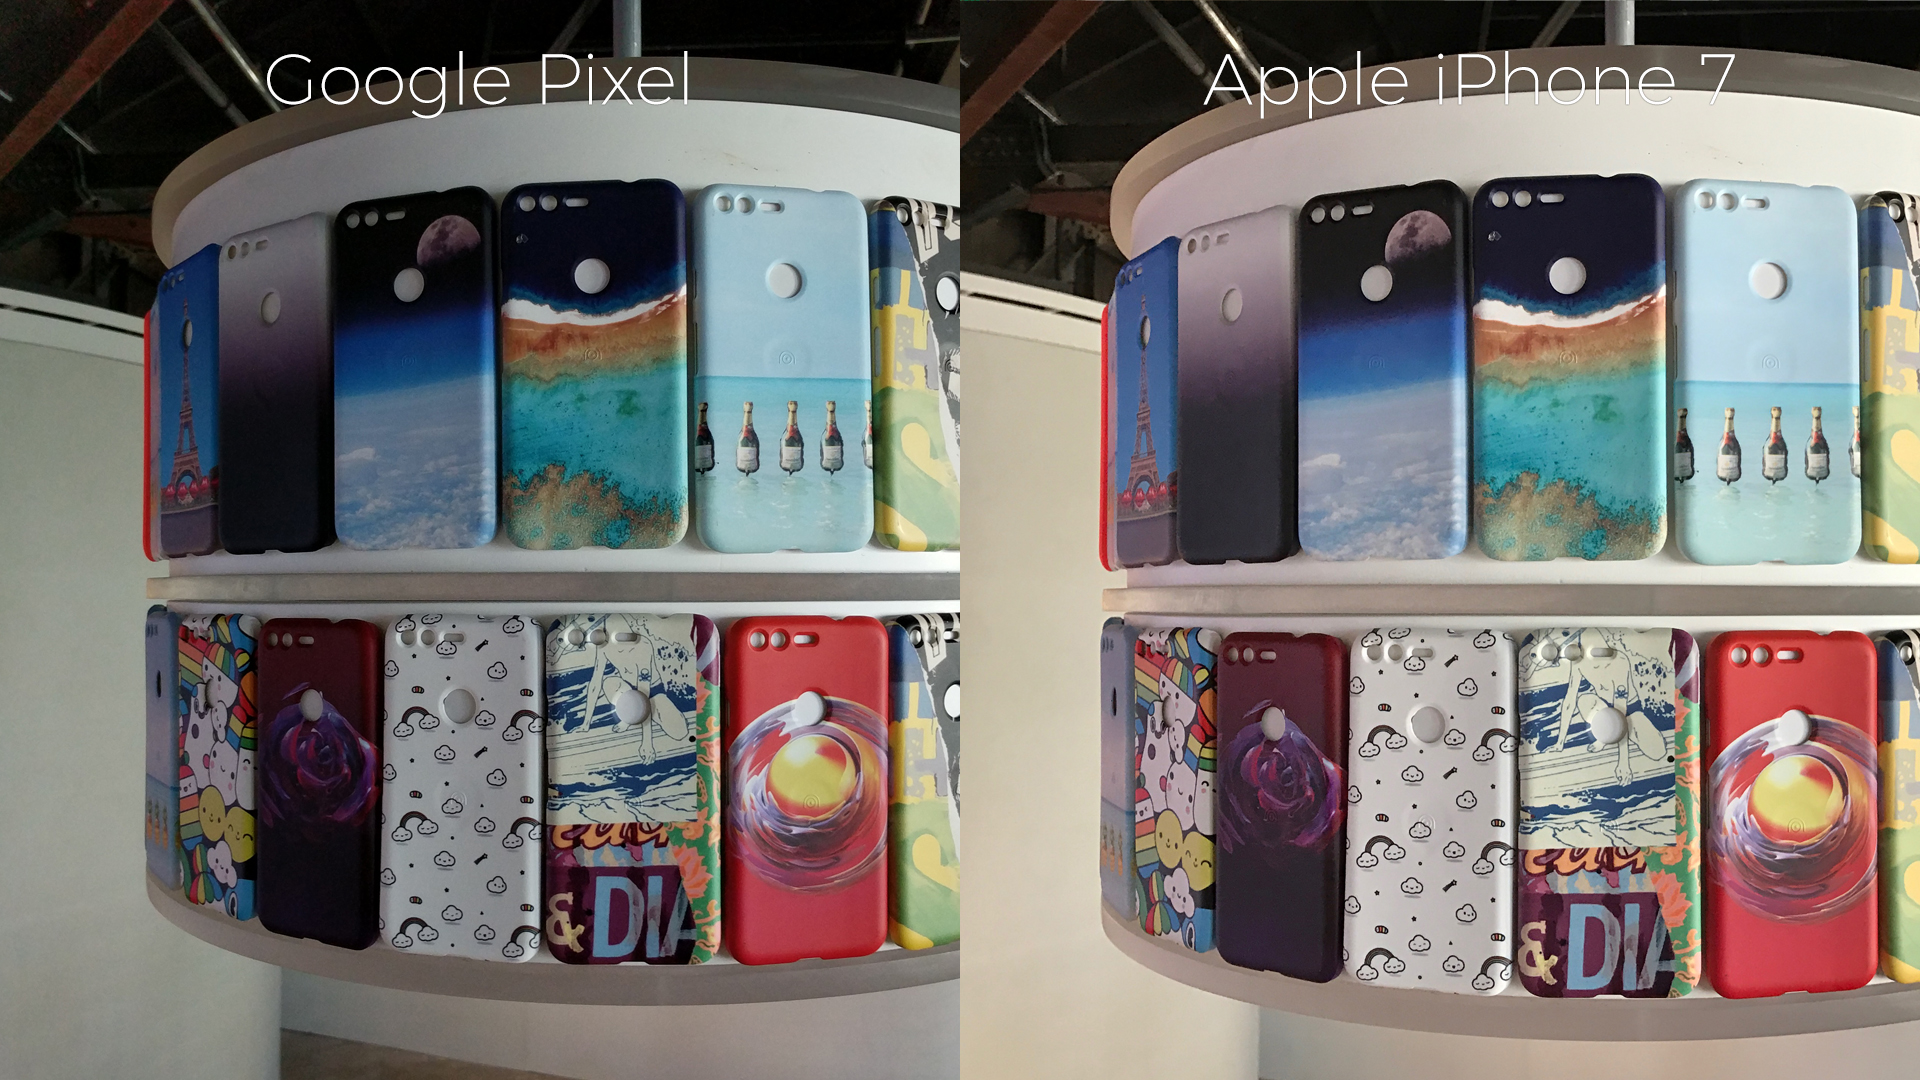 Google Pixel vs. iPhone 7: camera comparison [PHOTOS]